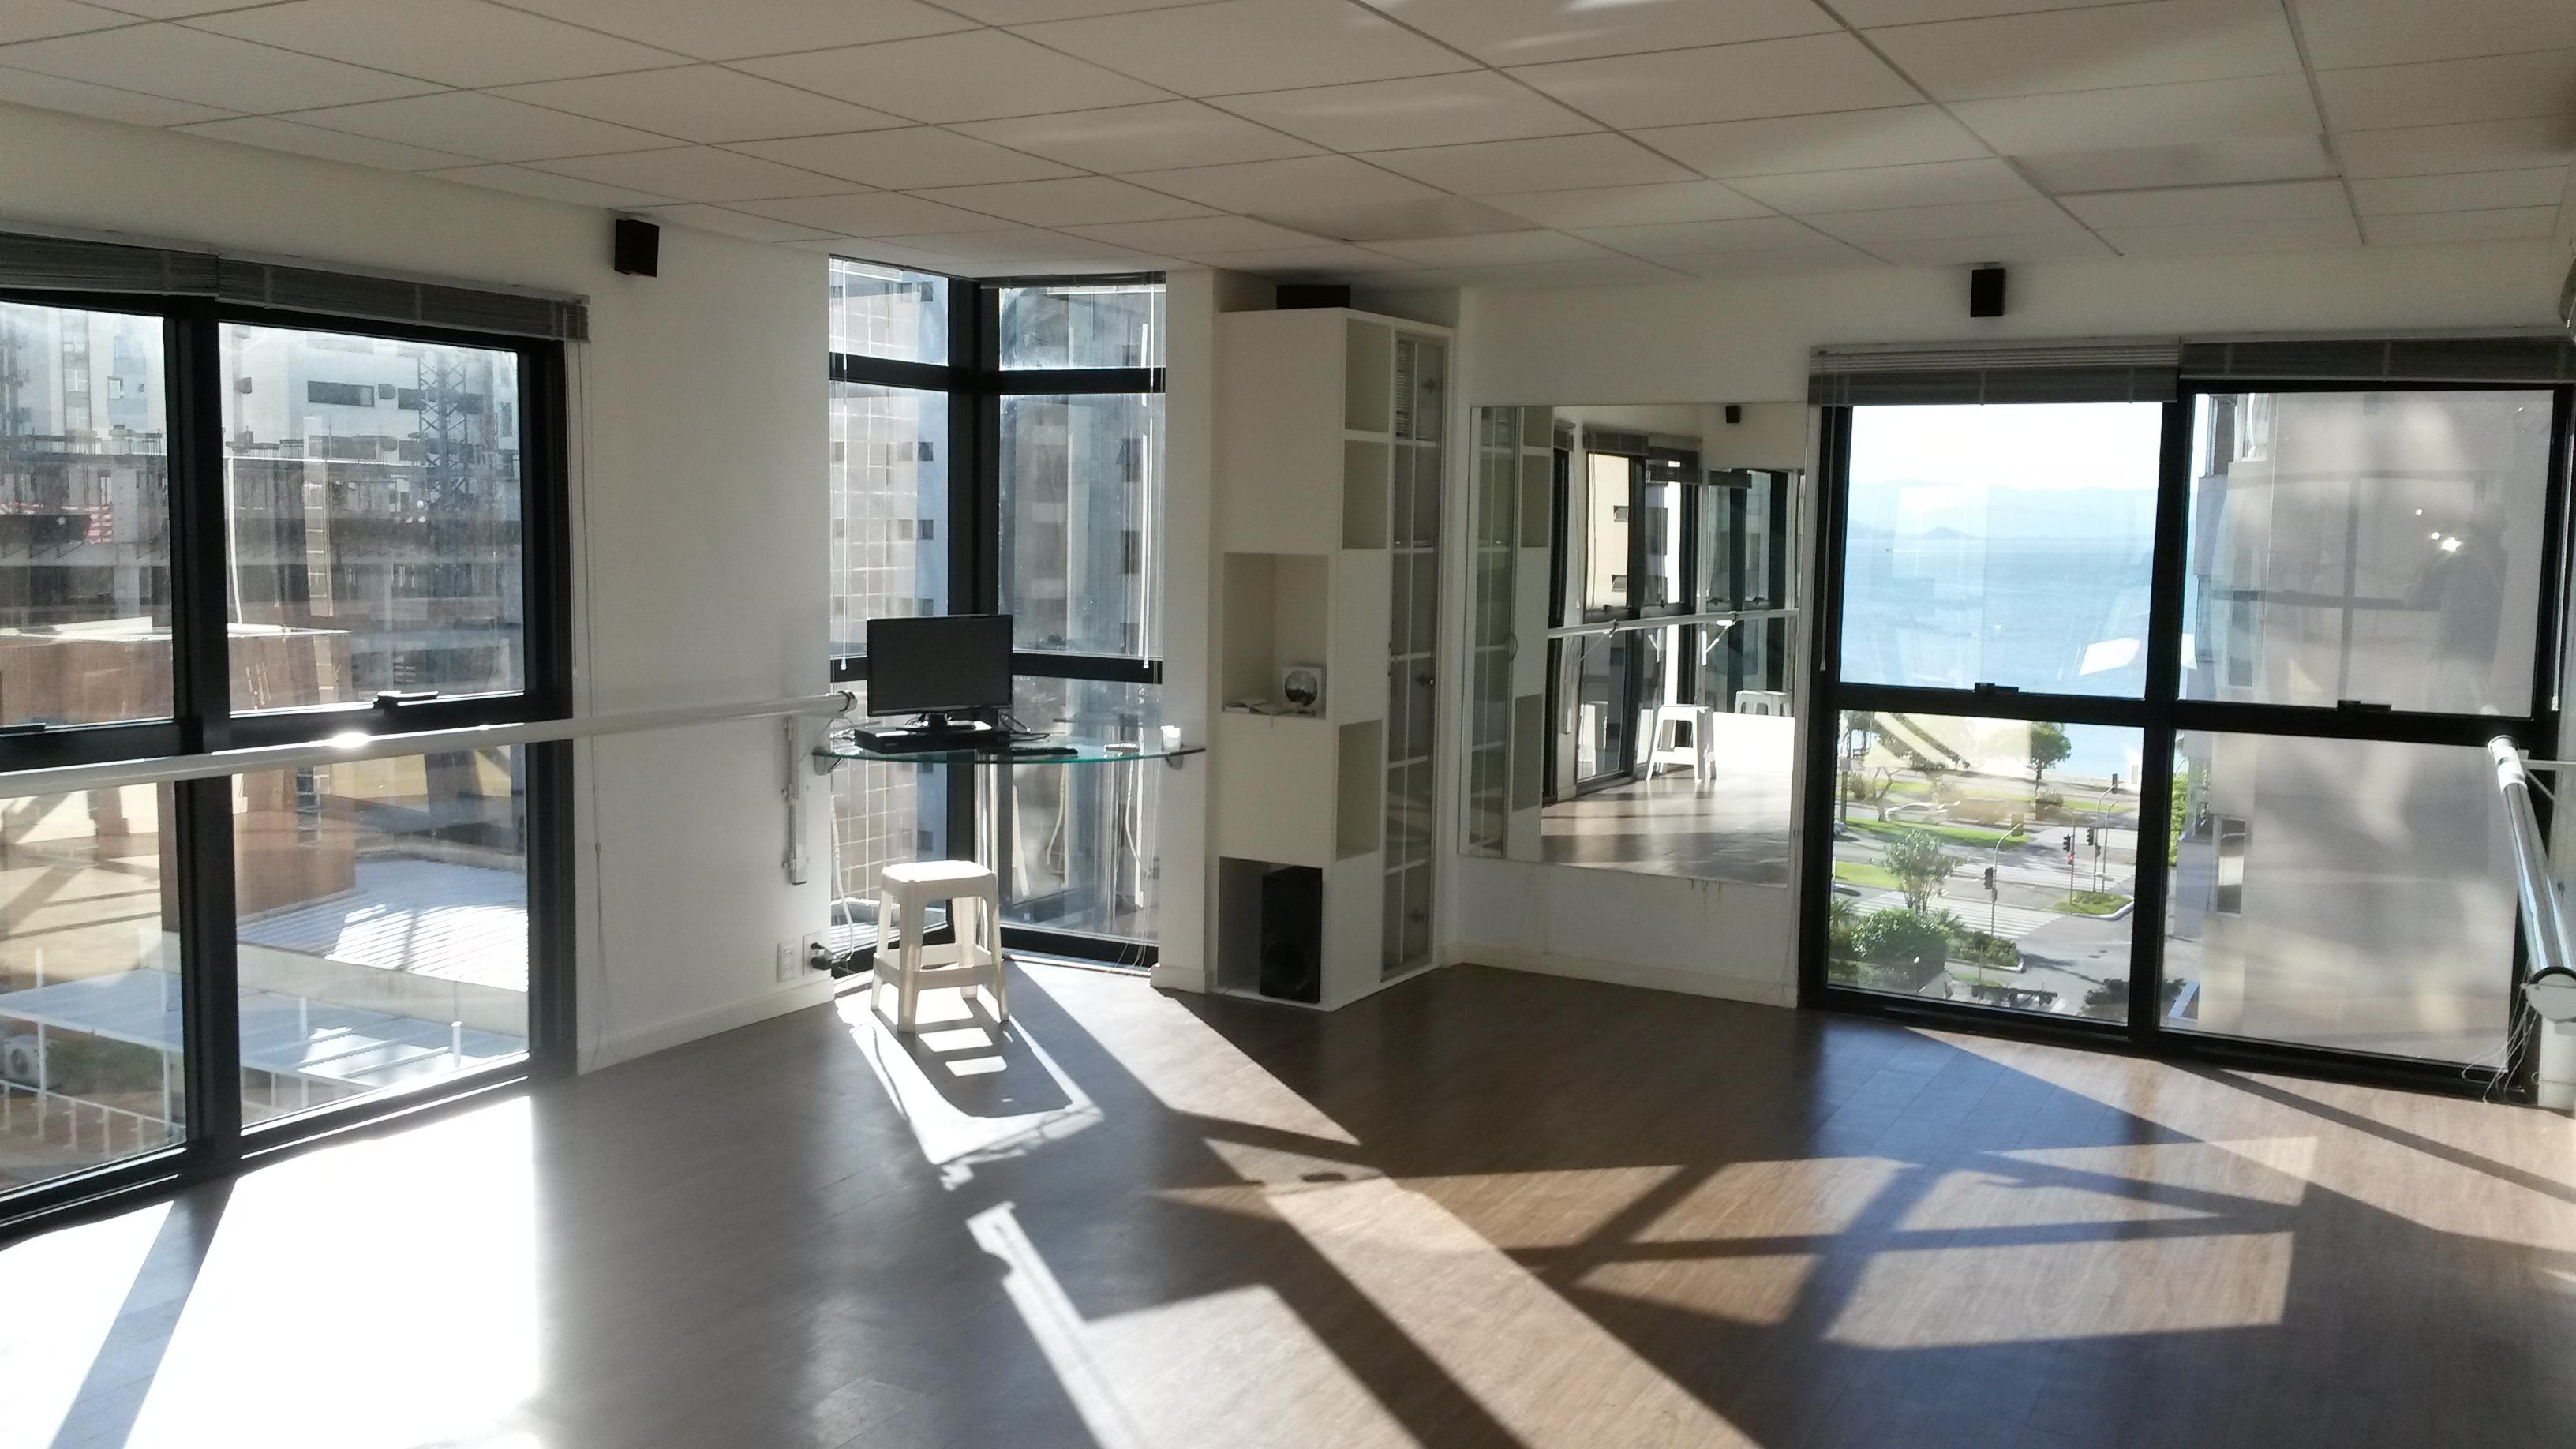 bon-vivant-studio-de-dança